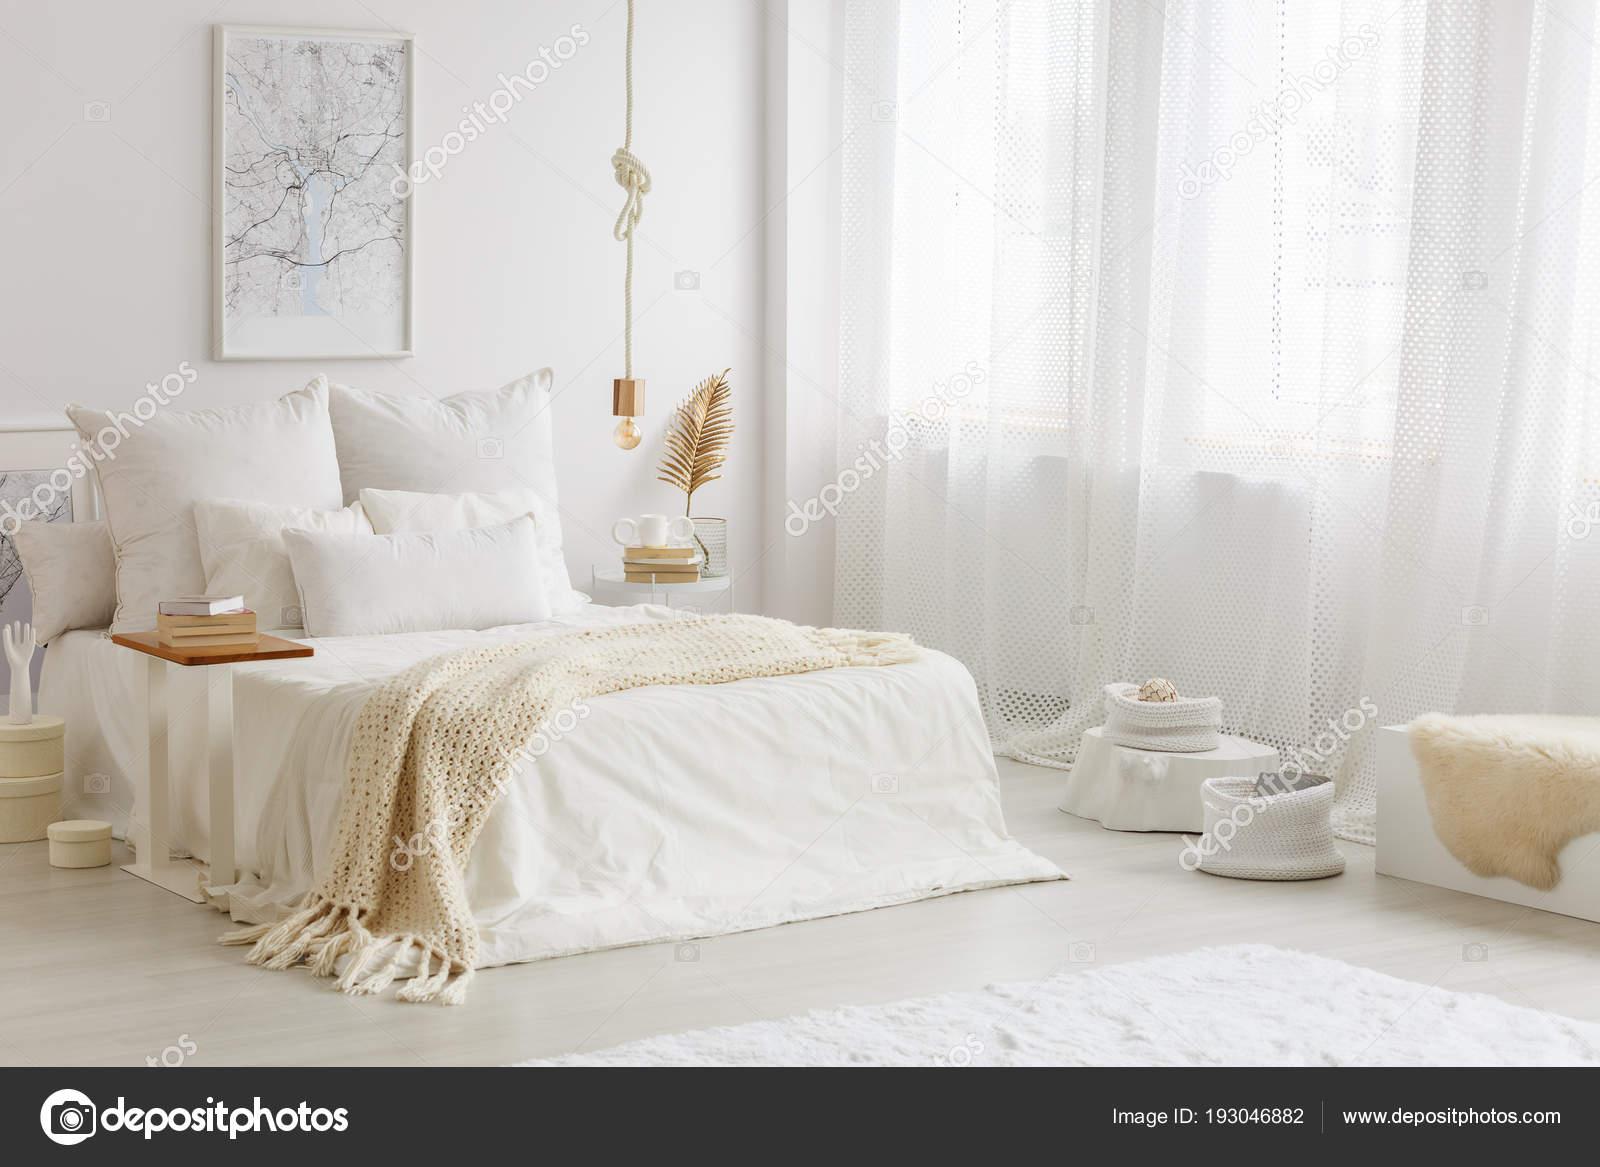 Warm White Gold Bedroom Interior Beige Blanket White Sheets ...